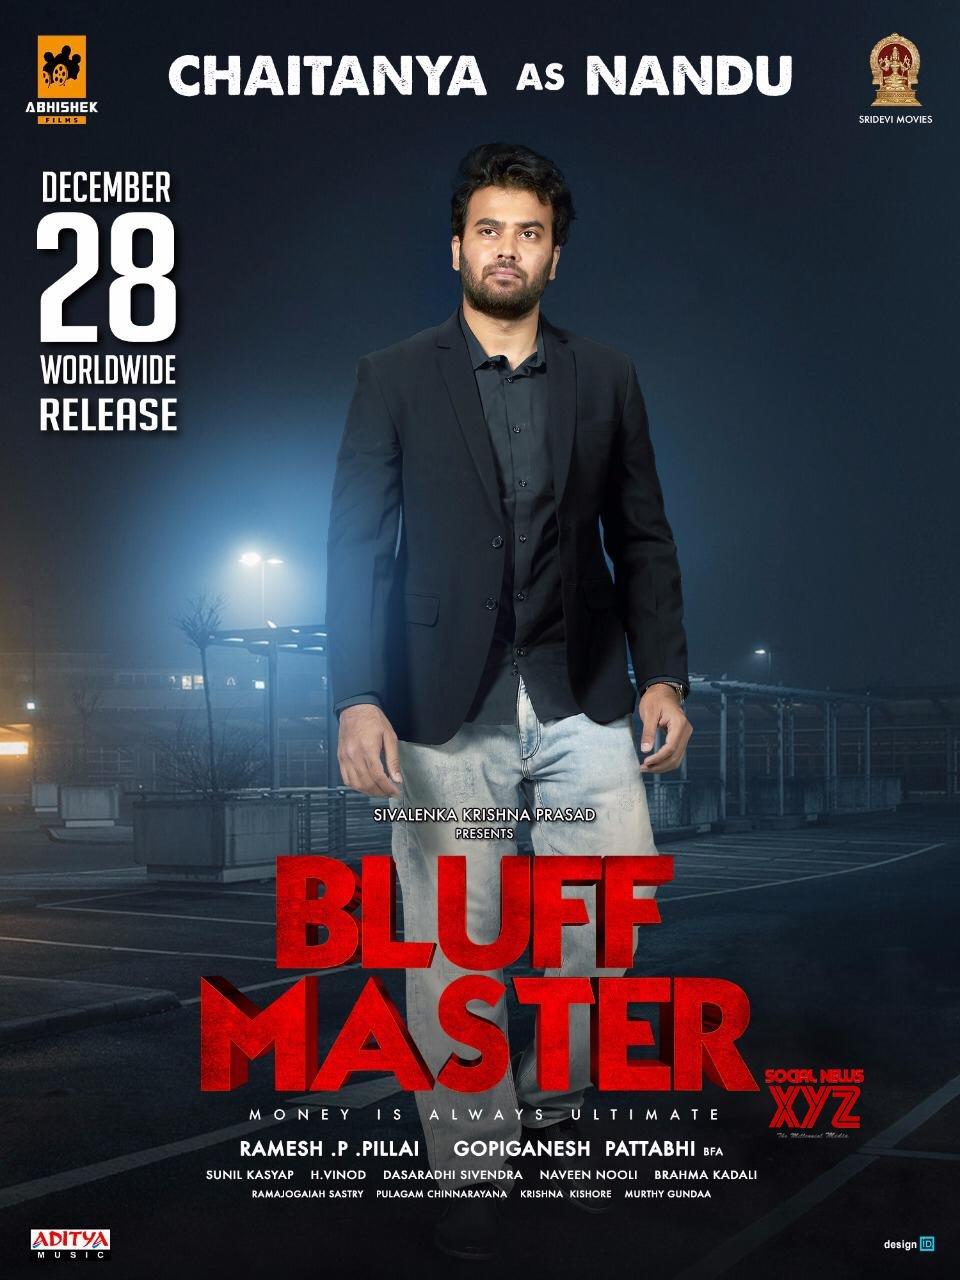 Chaitanya As Nandu From BluffMaster